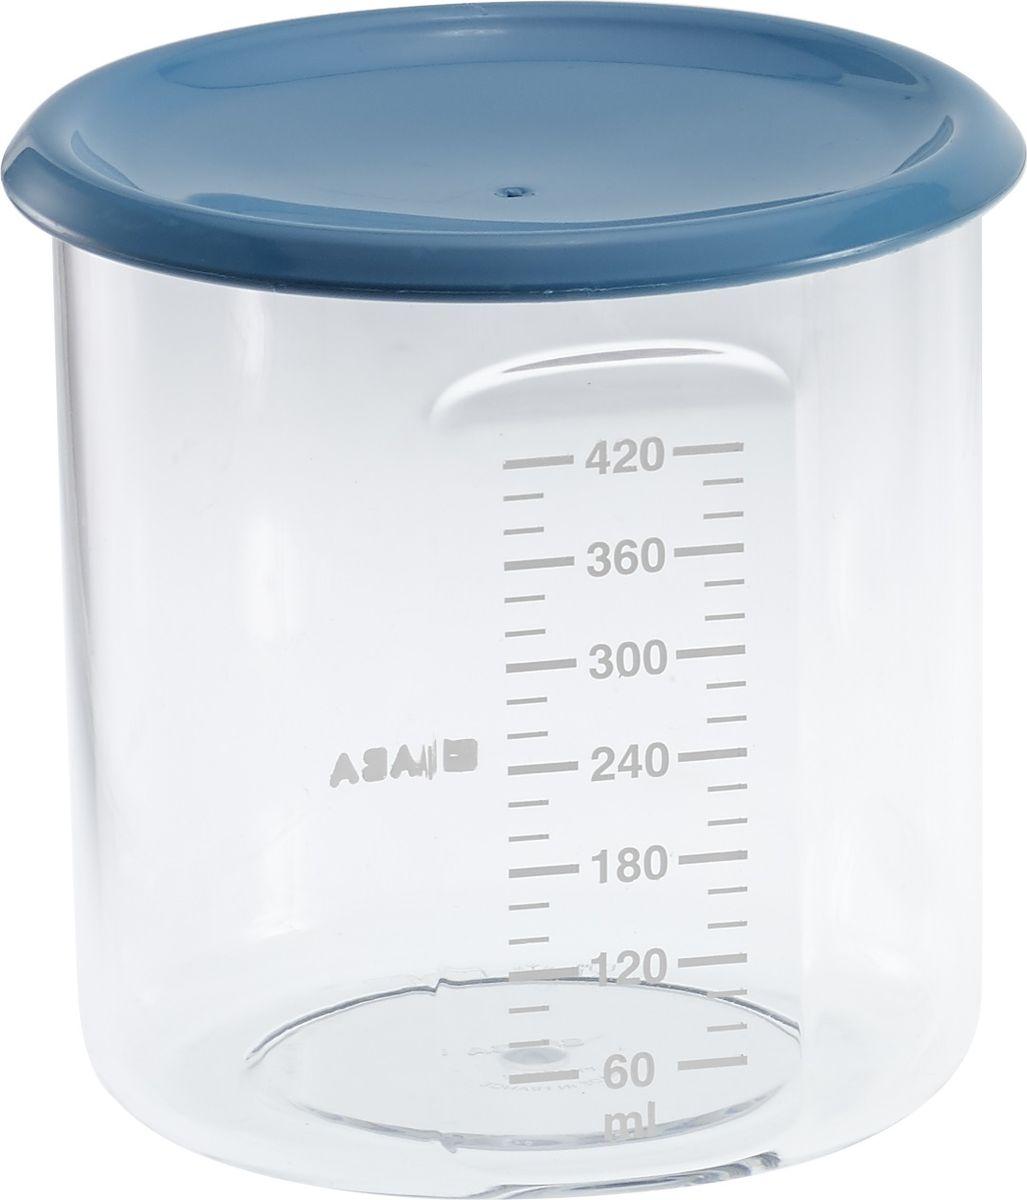 Beaba Контейнер для детского питания Maxi+Portion Tritan Blue 420 мл